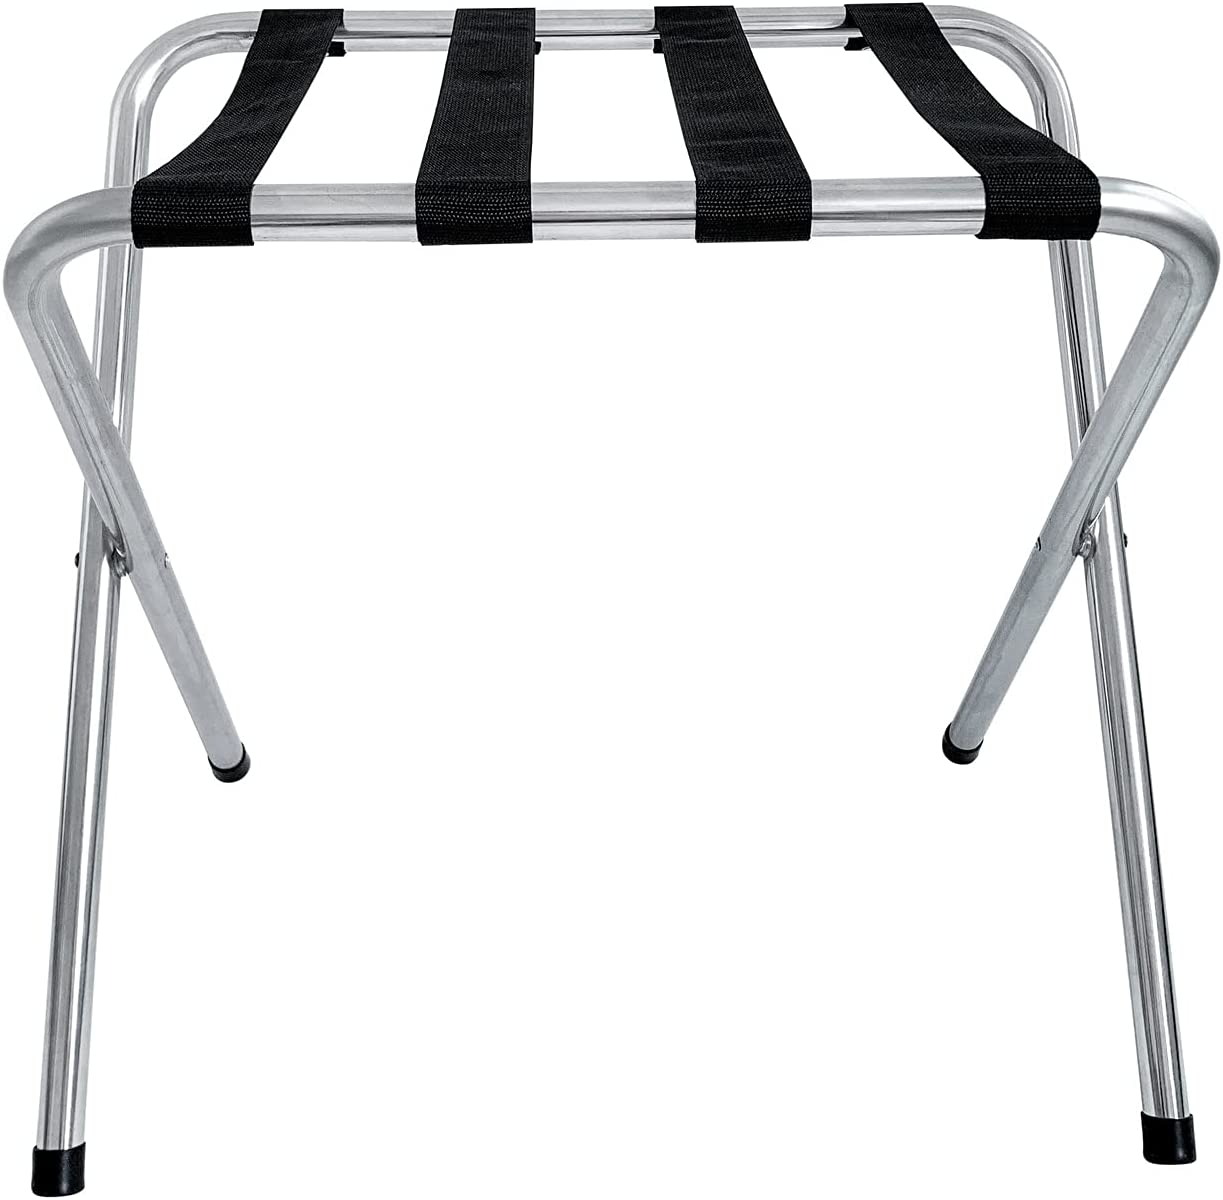 Metal Luggage Racks for Light Foldable I Storage Regular store Now free shipping